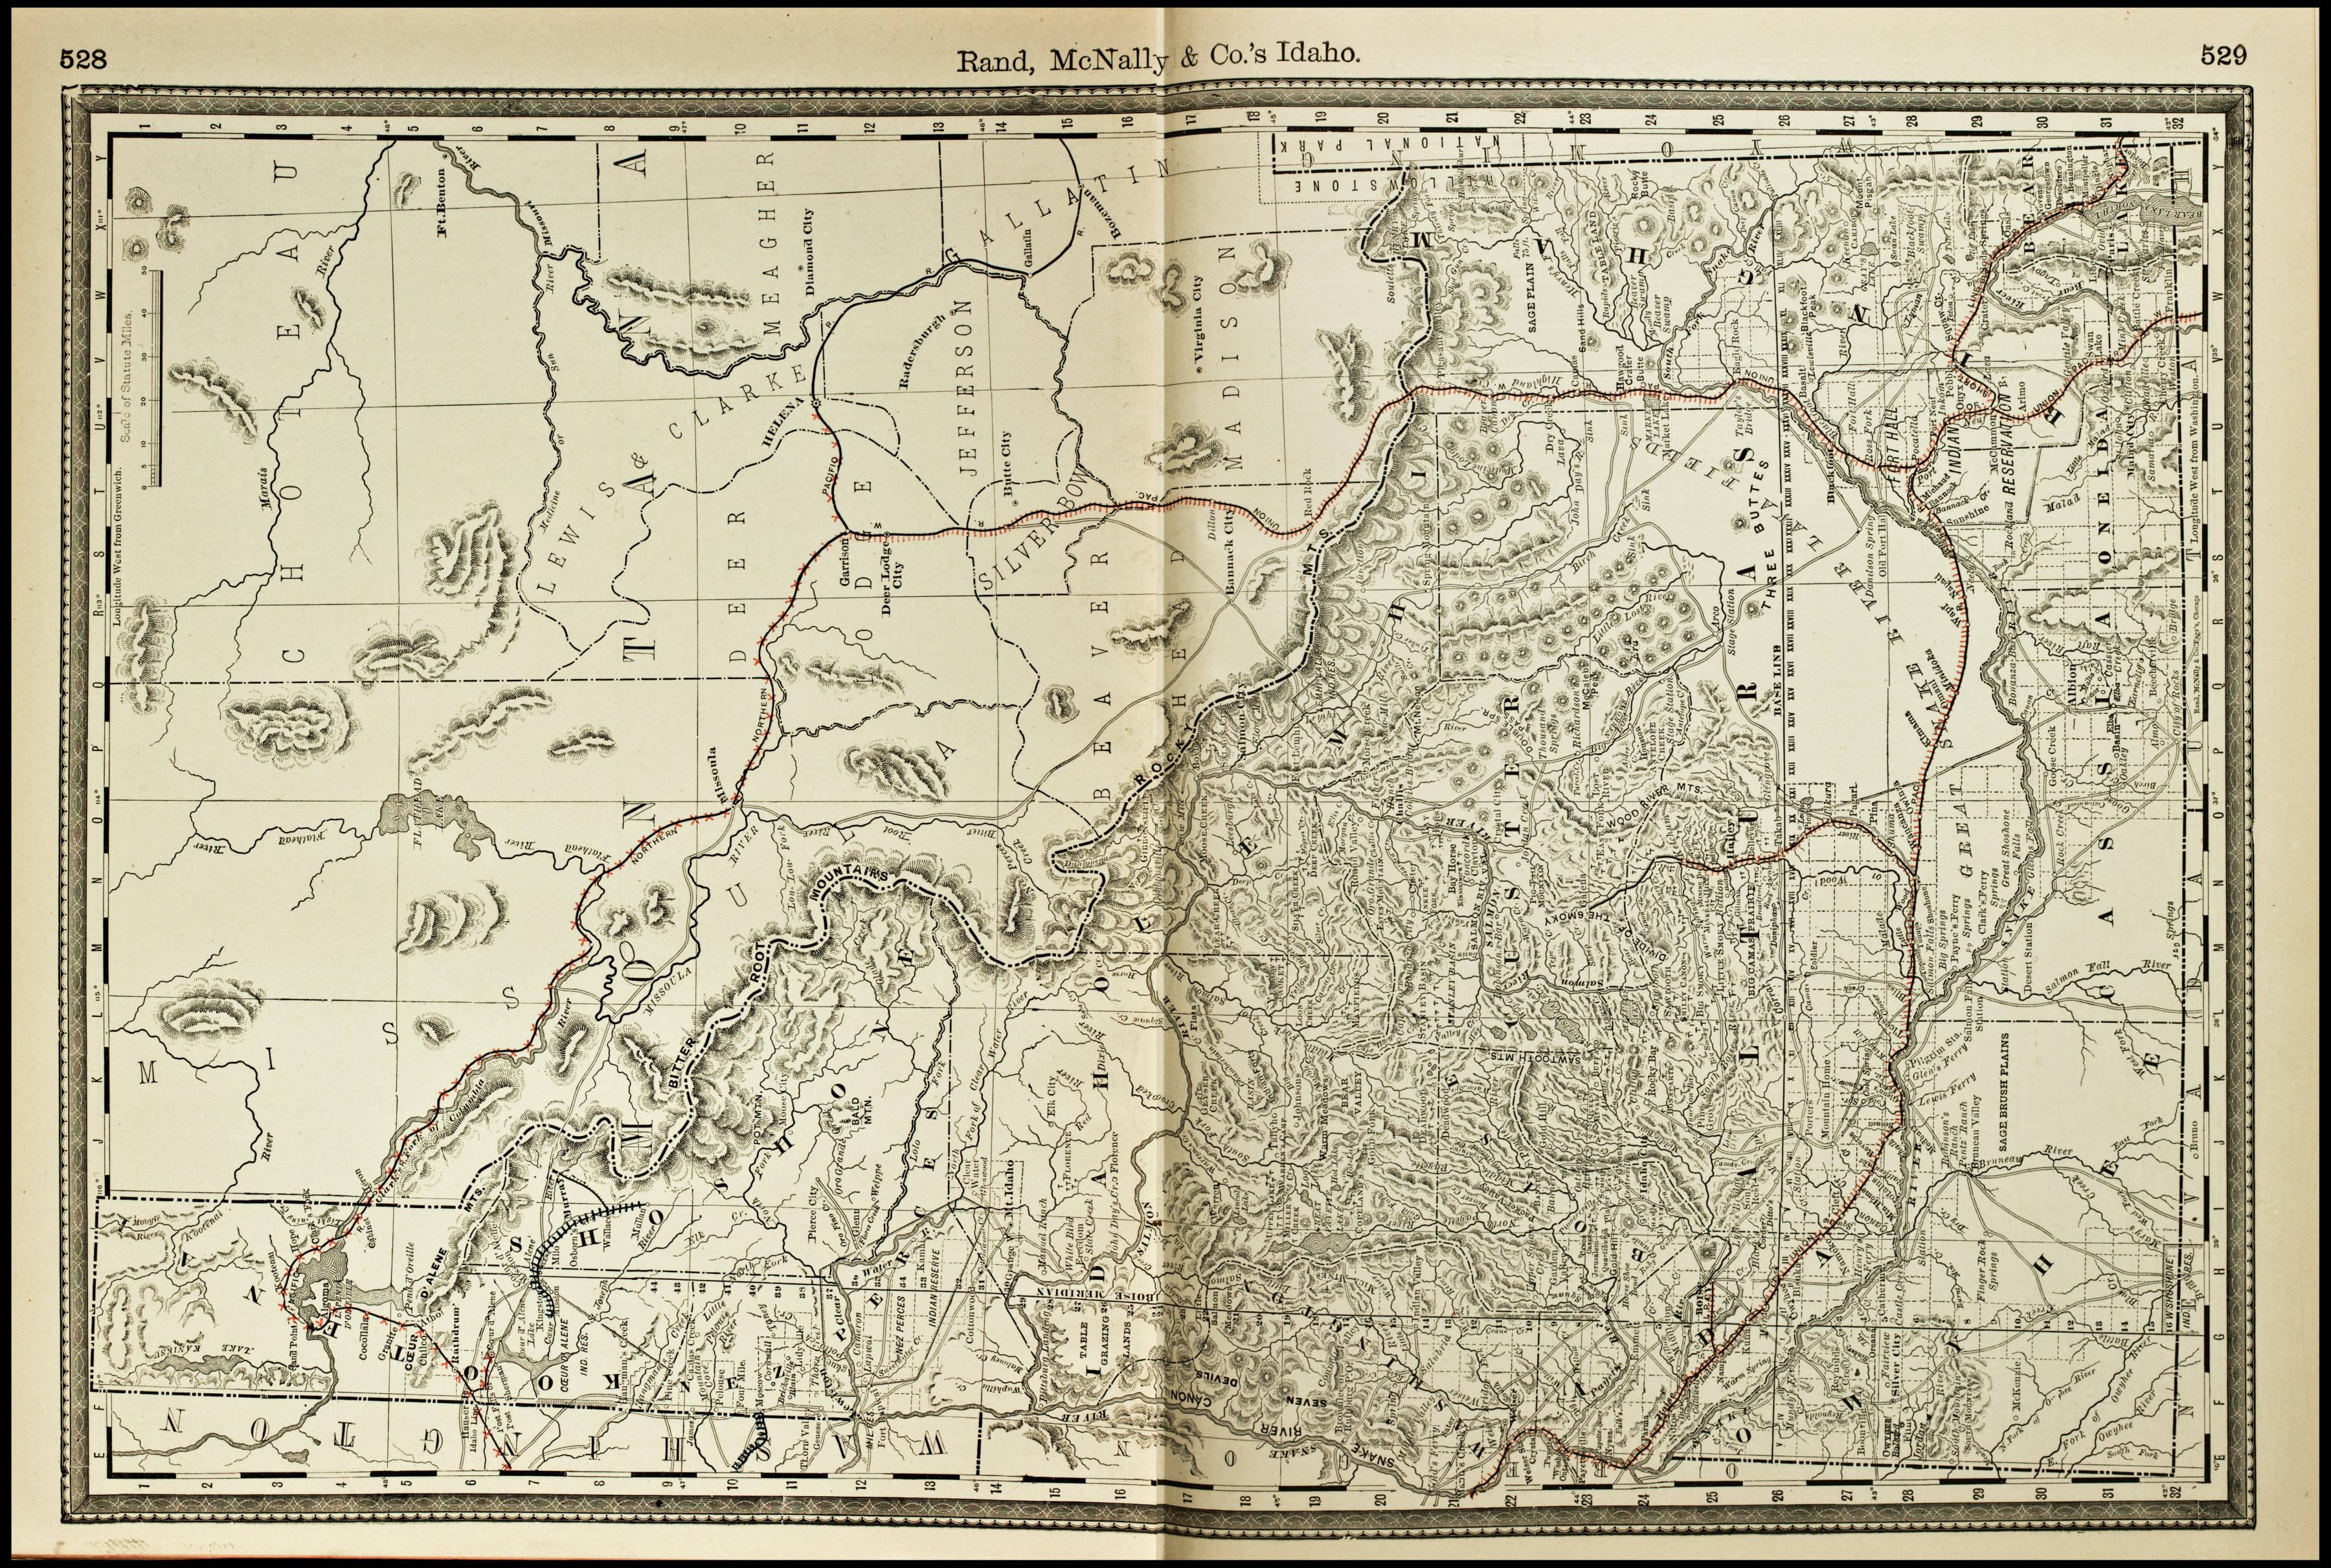 File:Rand, McNally & Co.'s map of Idaho (NBY 15524).jpg - Wikimedia on maine's map, california's map, idaho welfare map, oklahoma's map, idaho bureau of land management map, washington's map, saw hills of idaho map, idaho hunters map, idaho campgrounds map, oregon map, idaho farmland map, idaho county map, north idaho map,